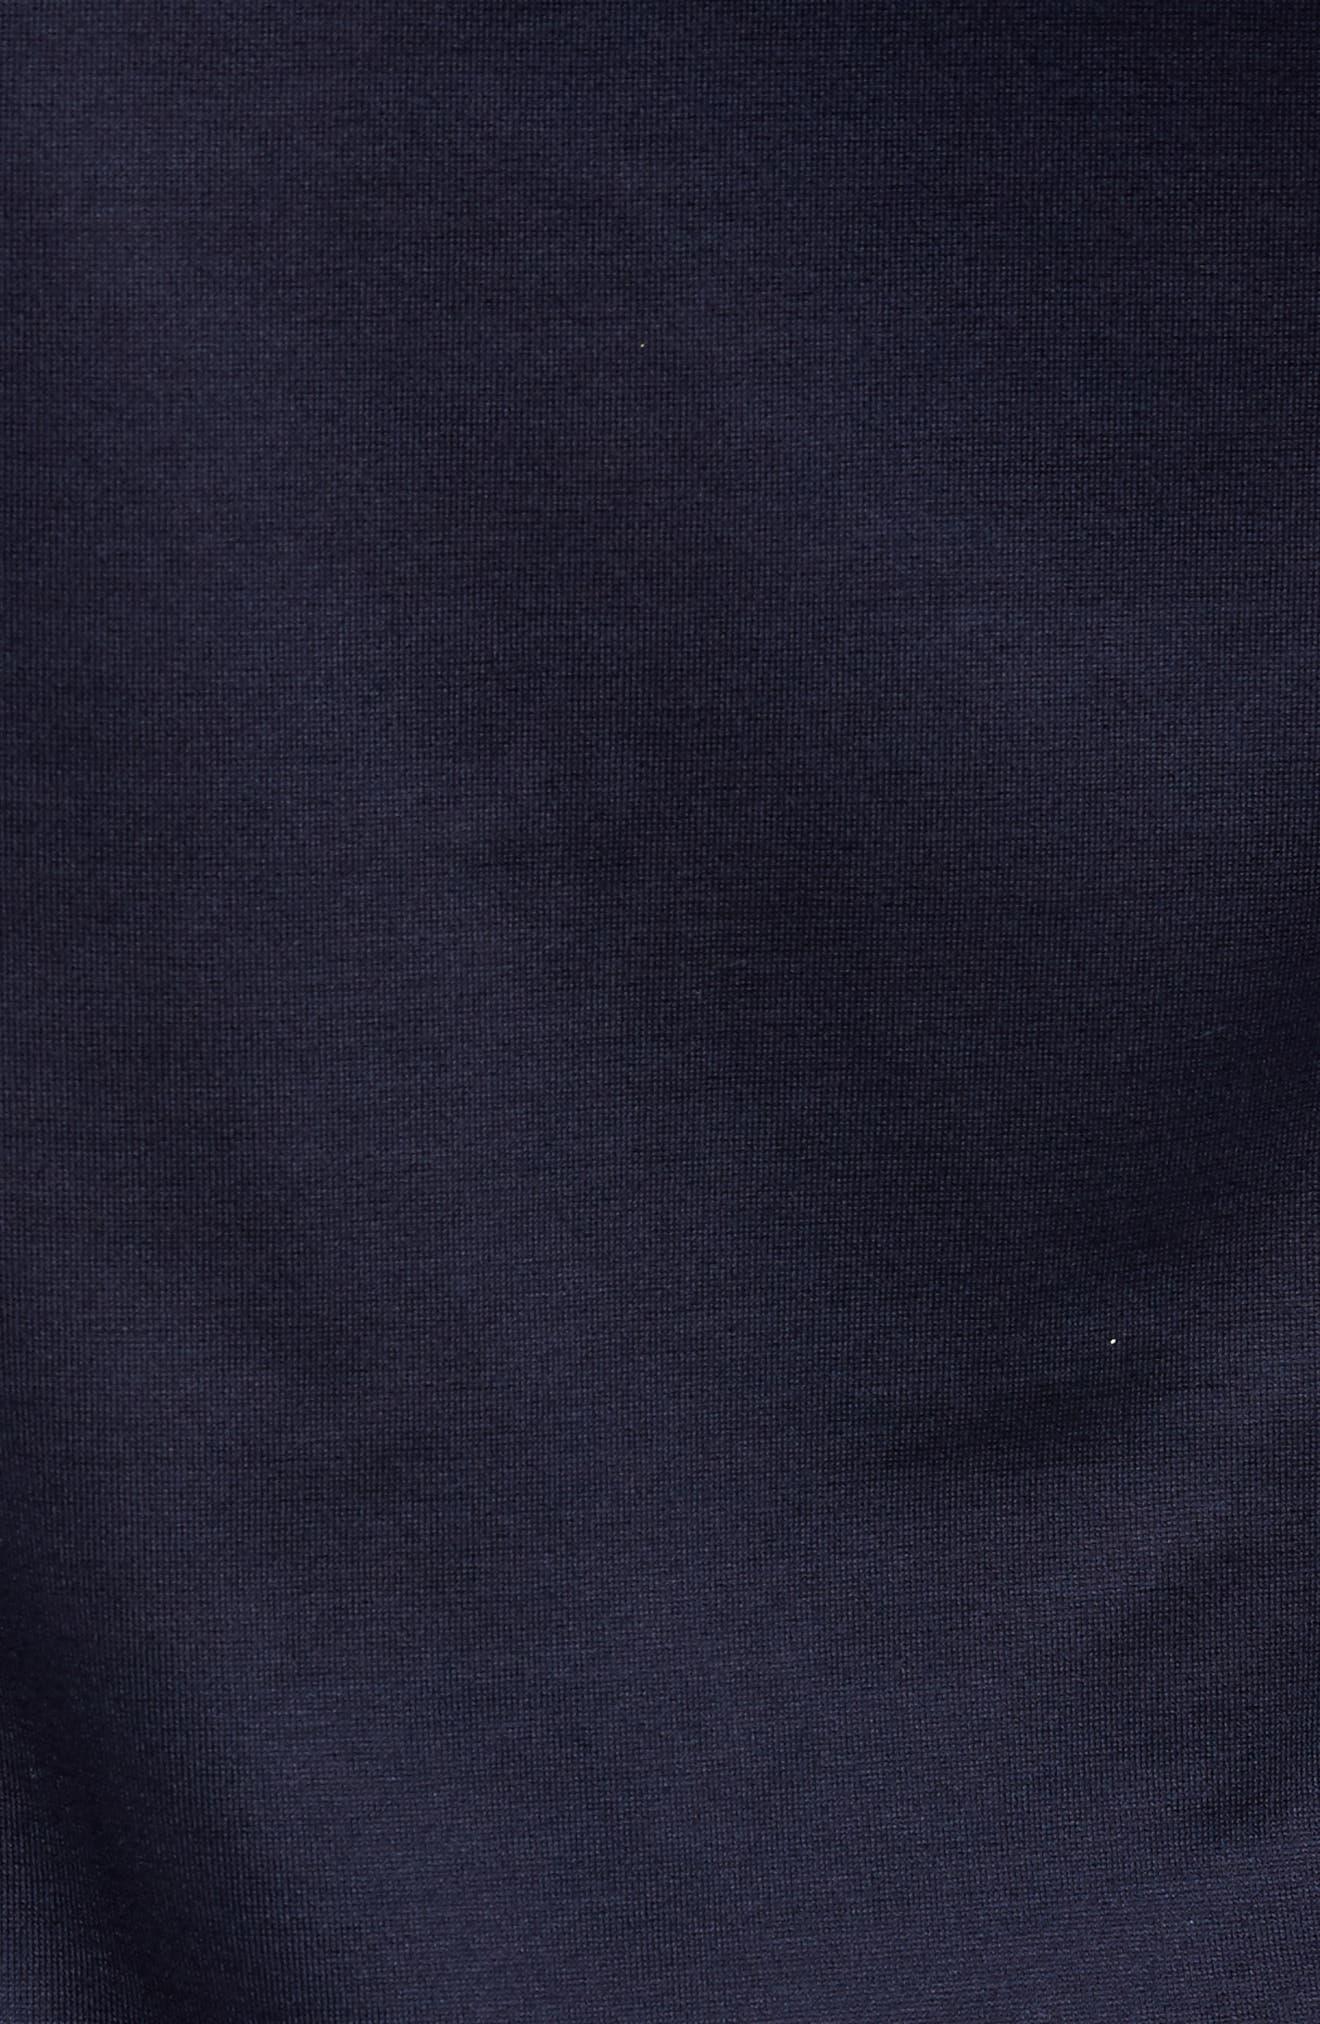 Jersey Sport Shirt,                             Alternate thumbnail 5, color,                             Blue Navy